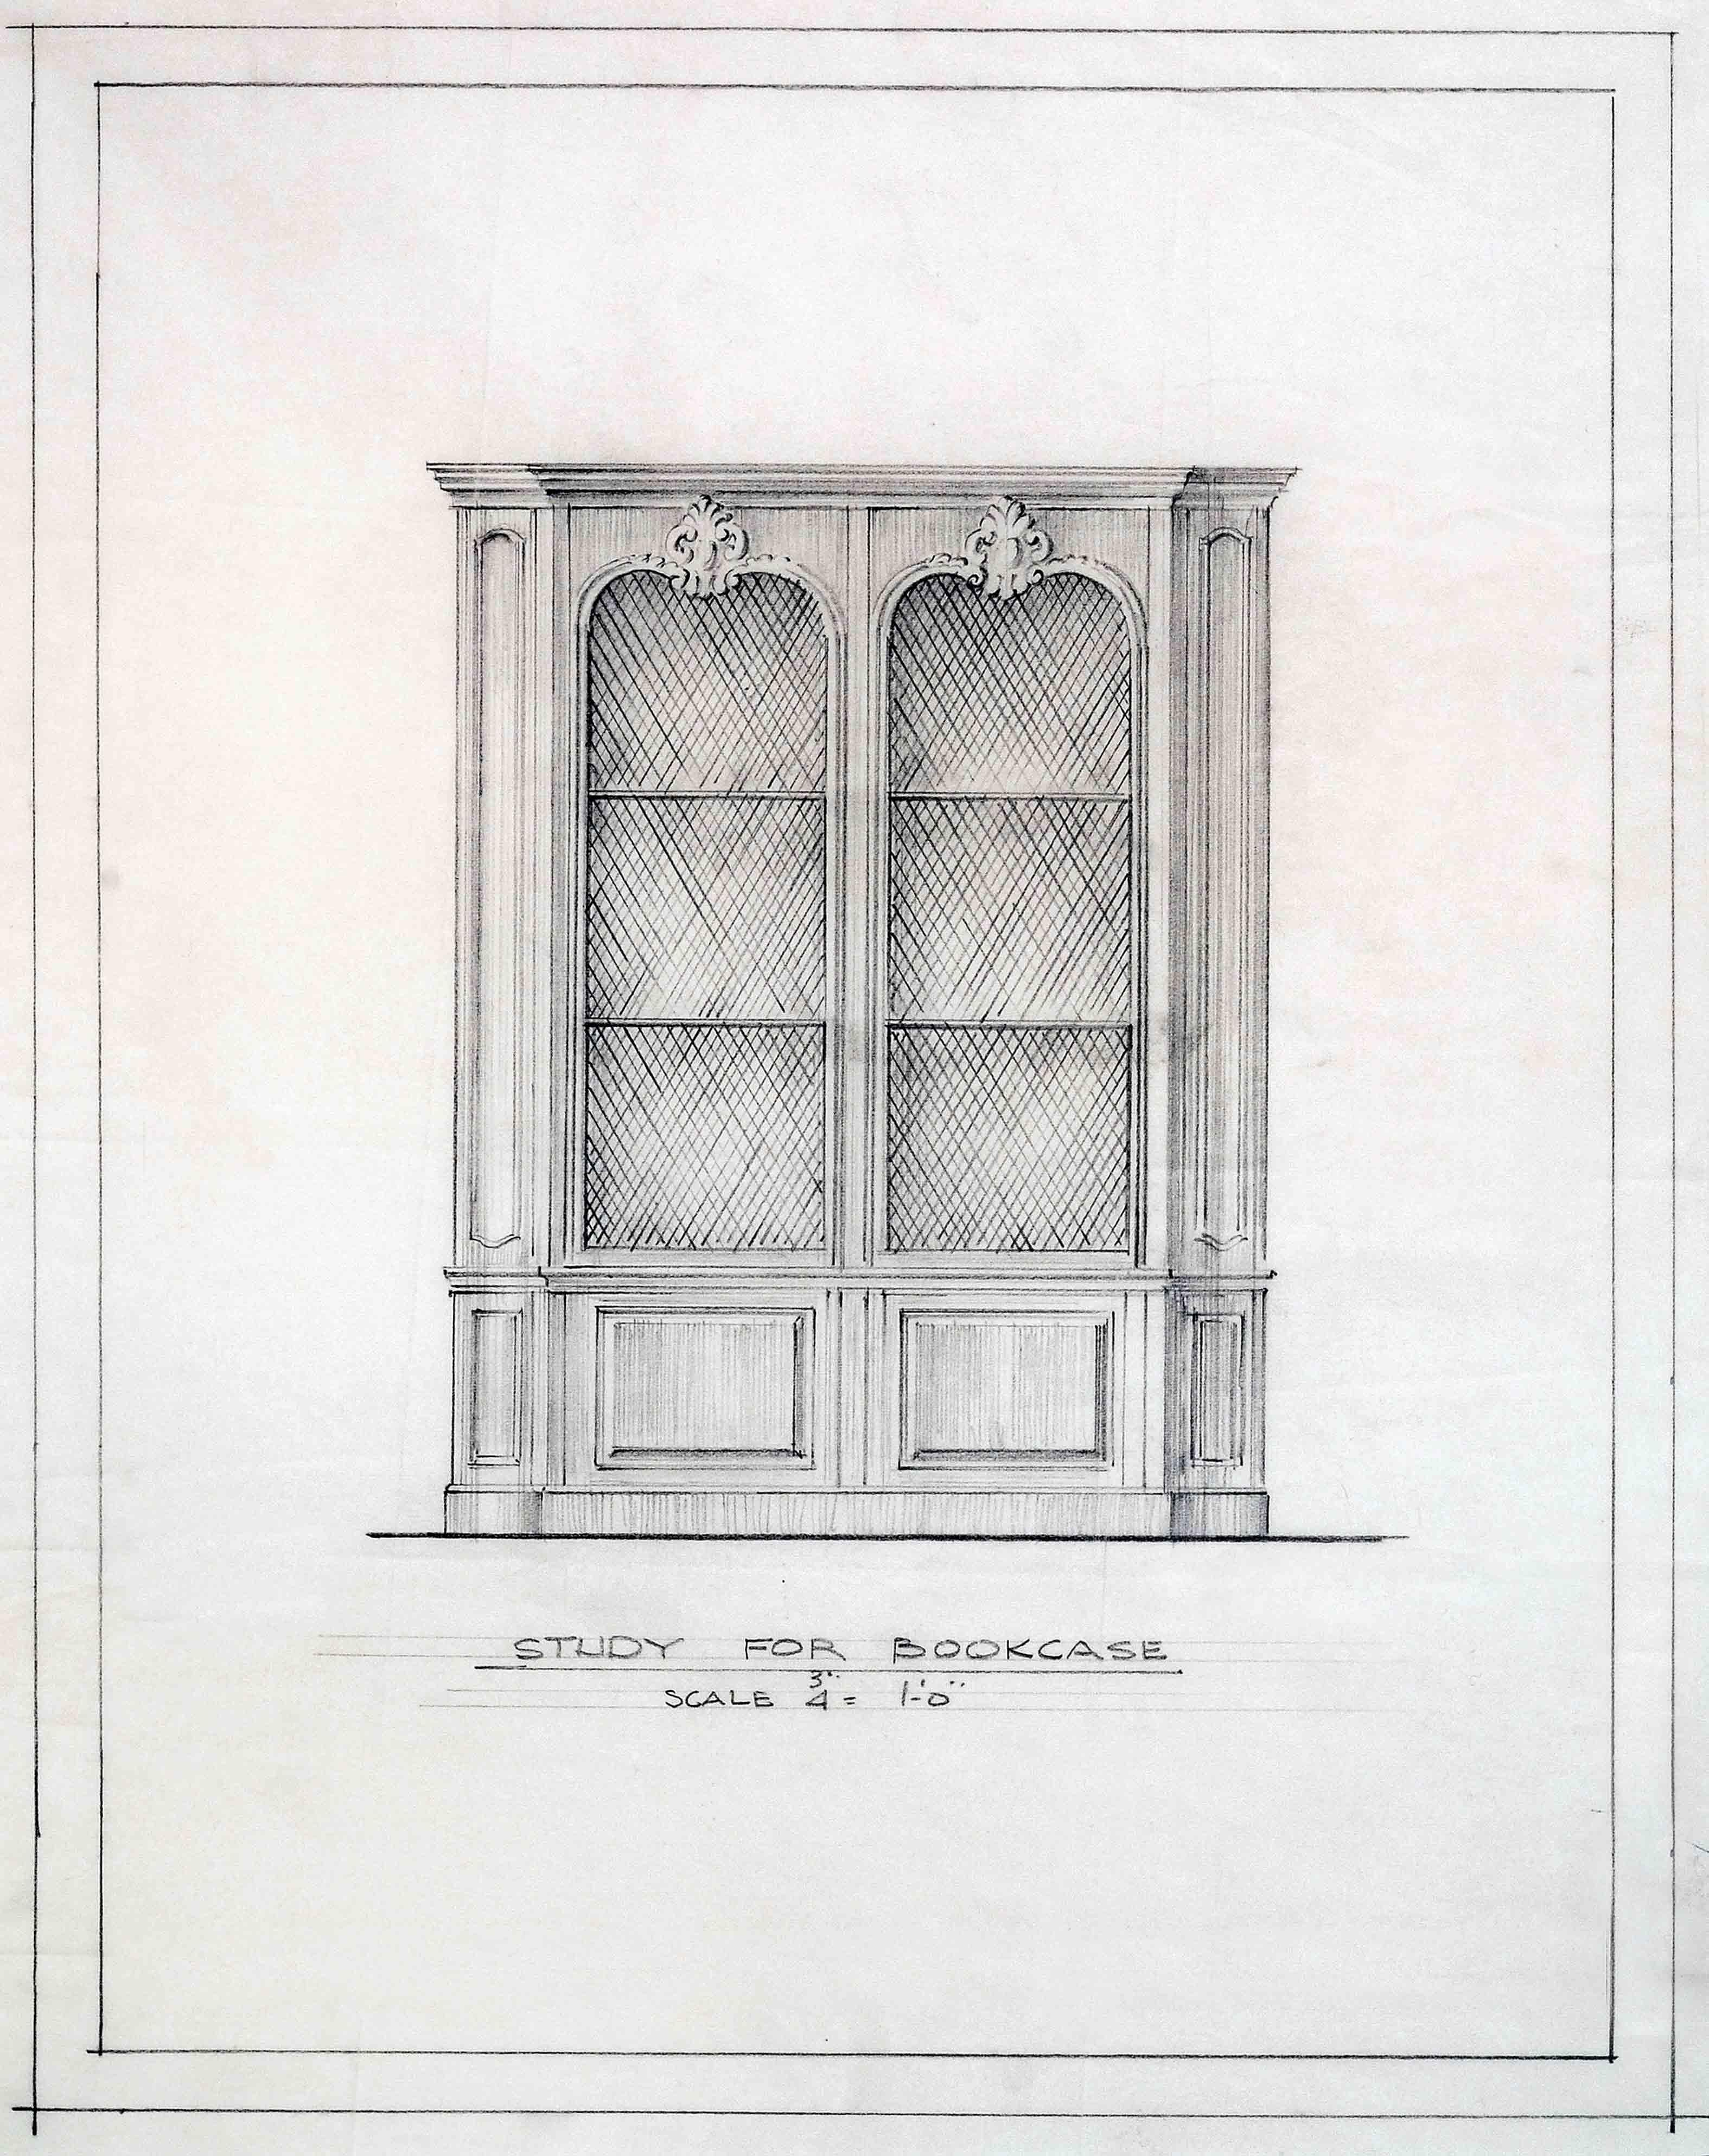 Frederic Rhinelander King, Study for Bookcase Design. Dumbarton Oaks Archives, AR.AD.MW.GL.003